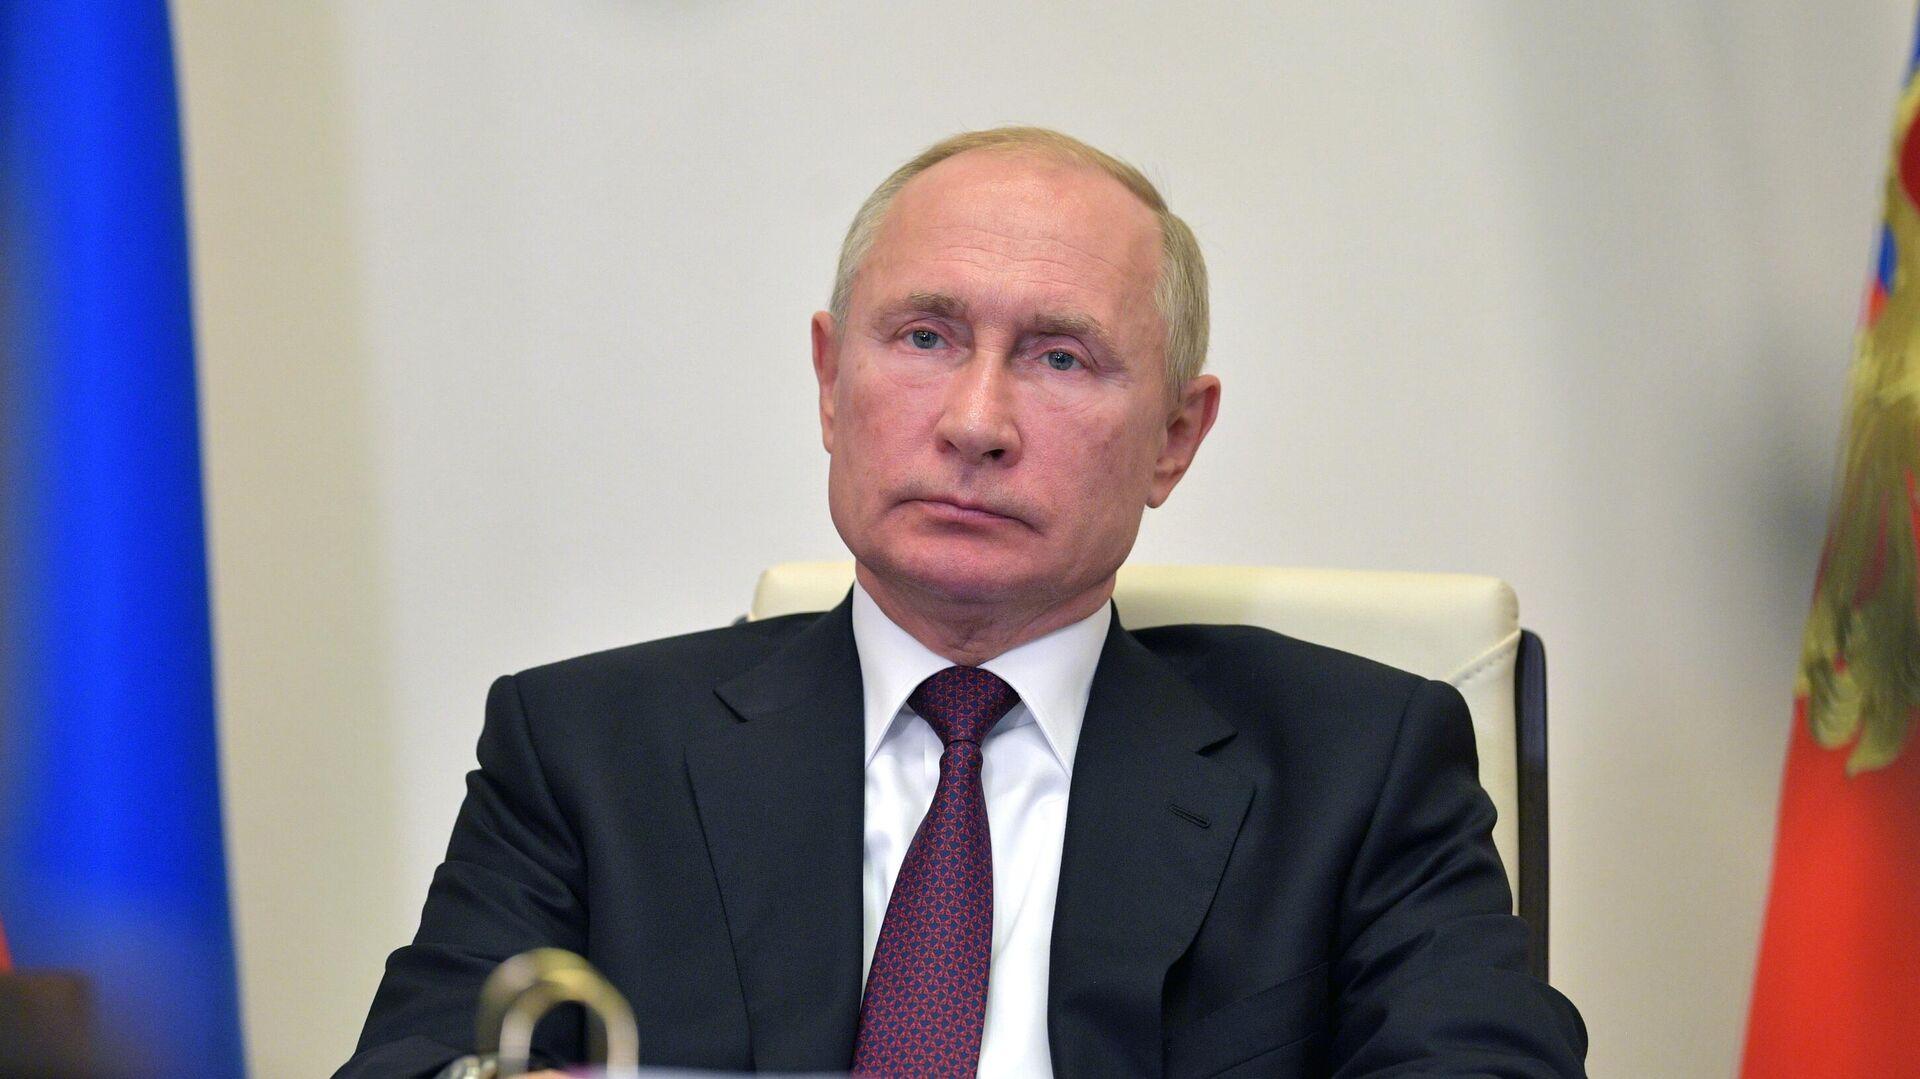 Президент РФ Владимир Путин во время видеоконференции - РИА Новости, 1920, 26.10.2020